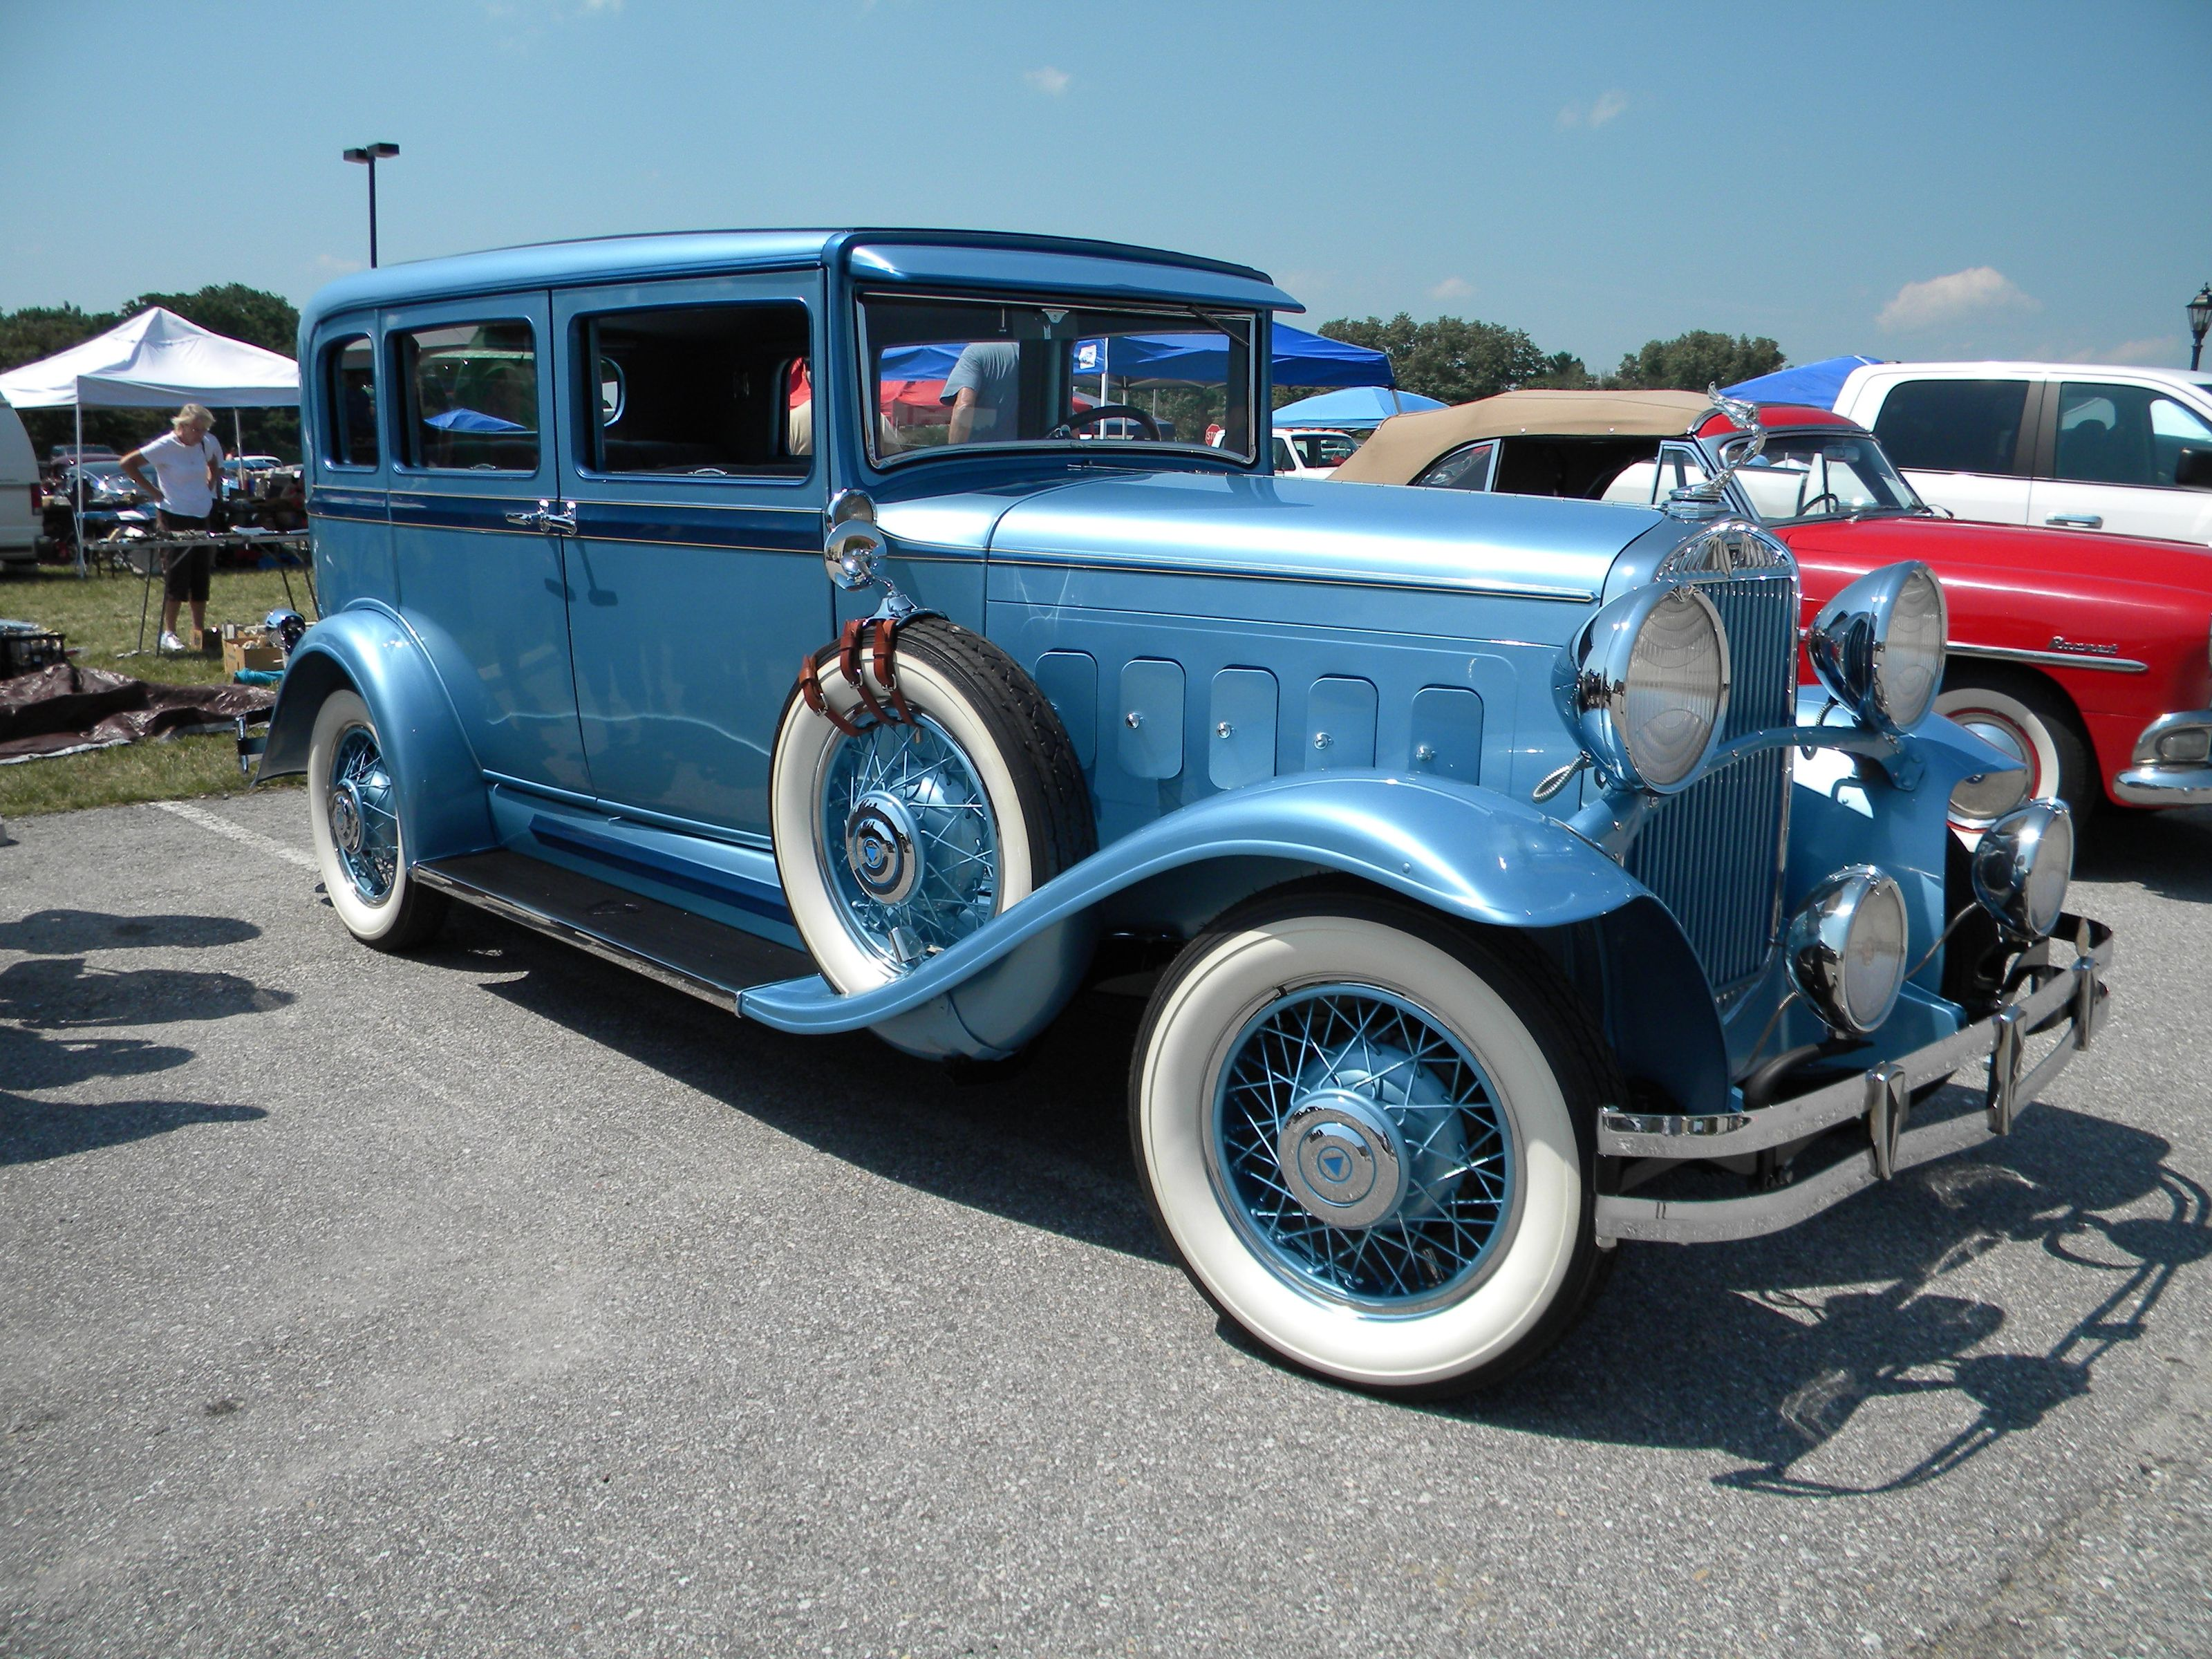 1930 Hudson, Great 8 Sedan